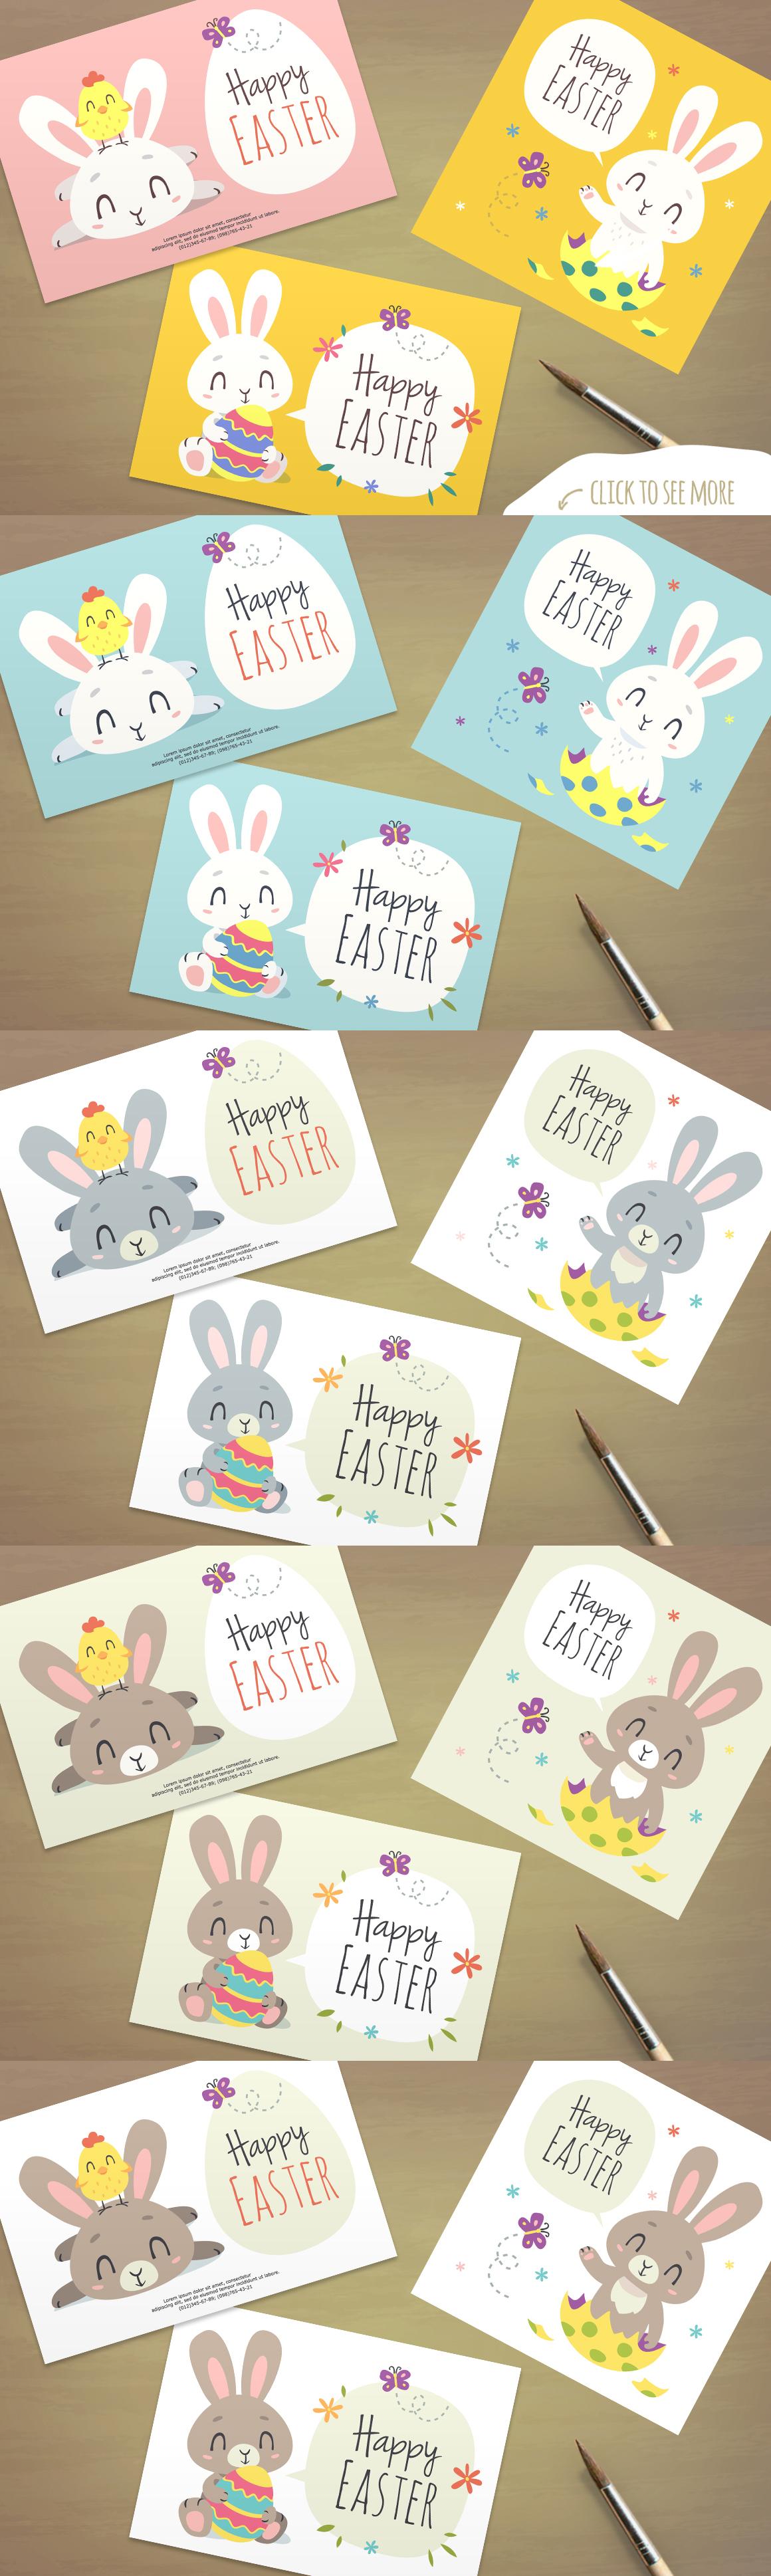 Easter Bunny Cartoon Set example image 6